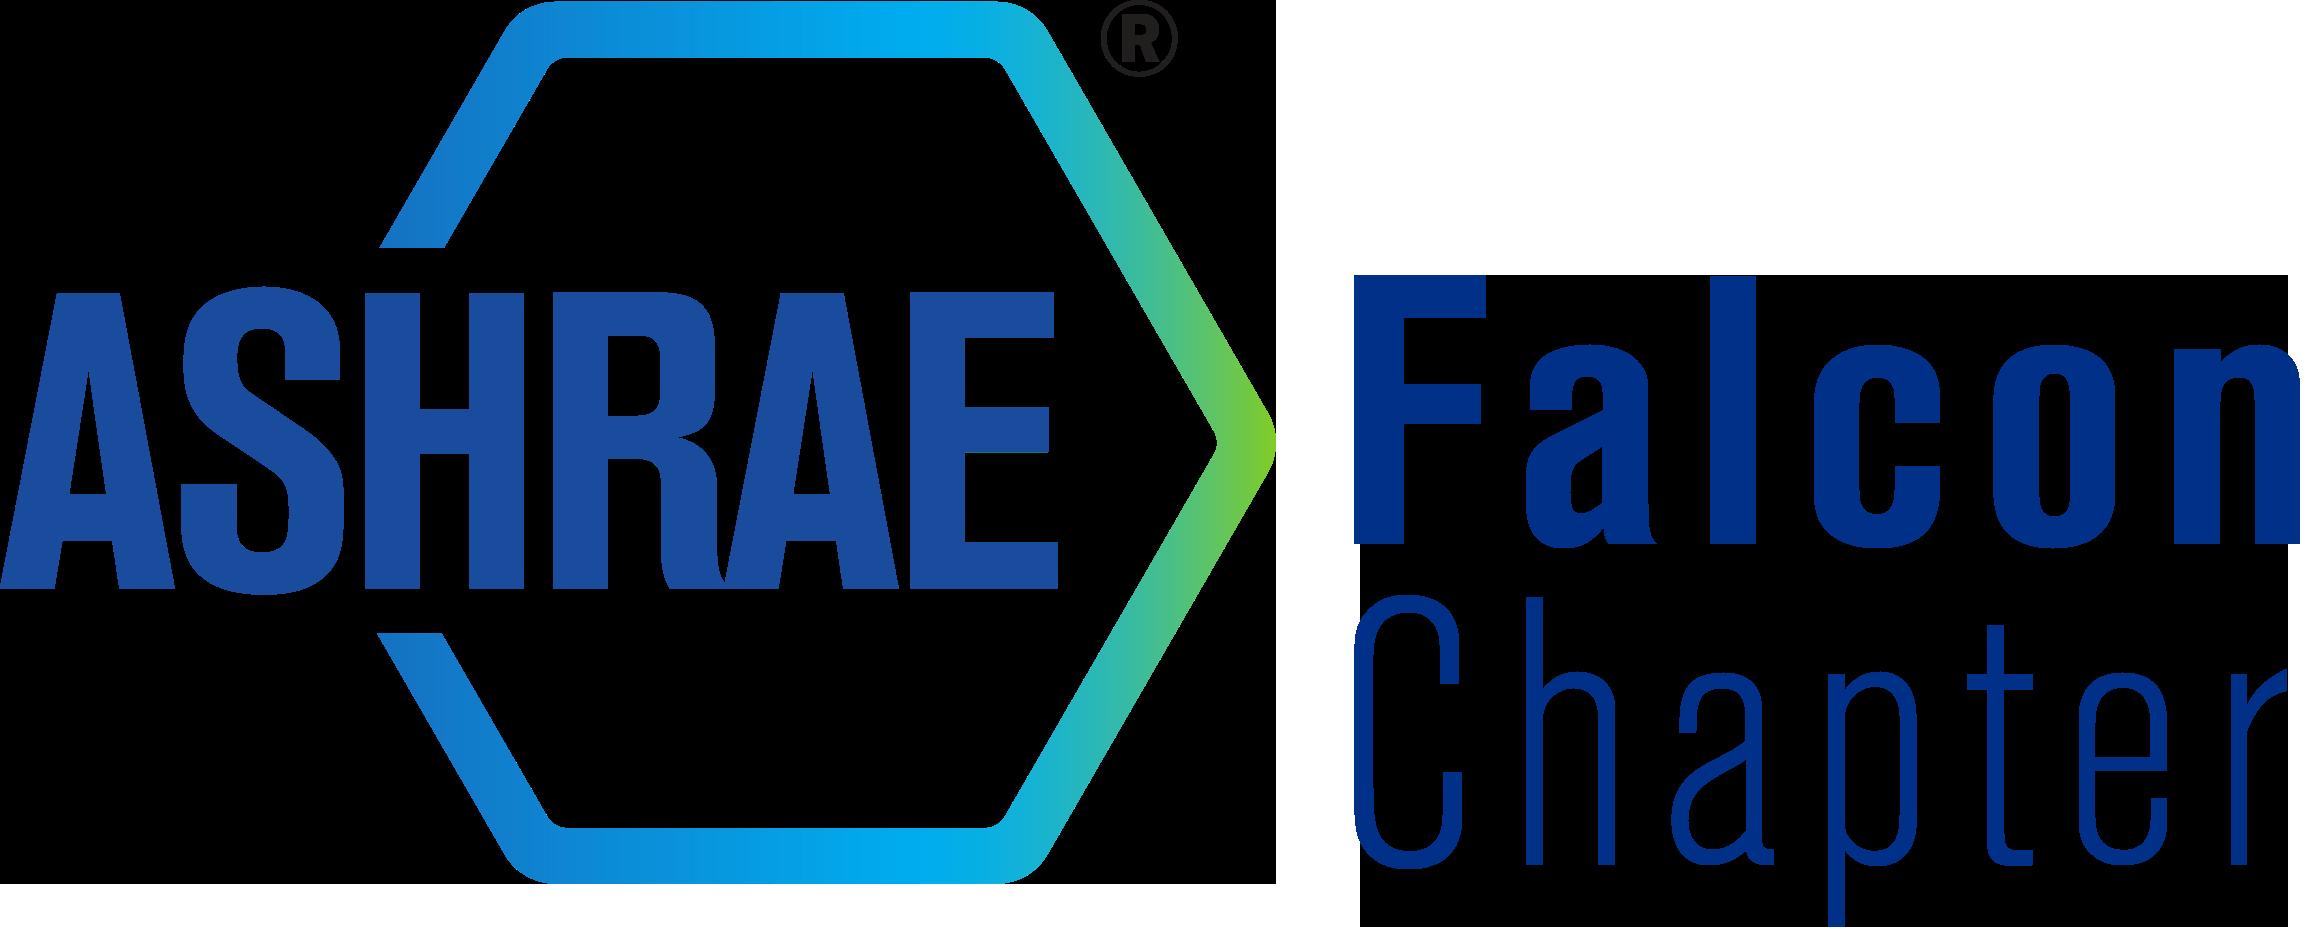 RAL timeline - ASHRAE RAL